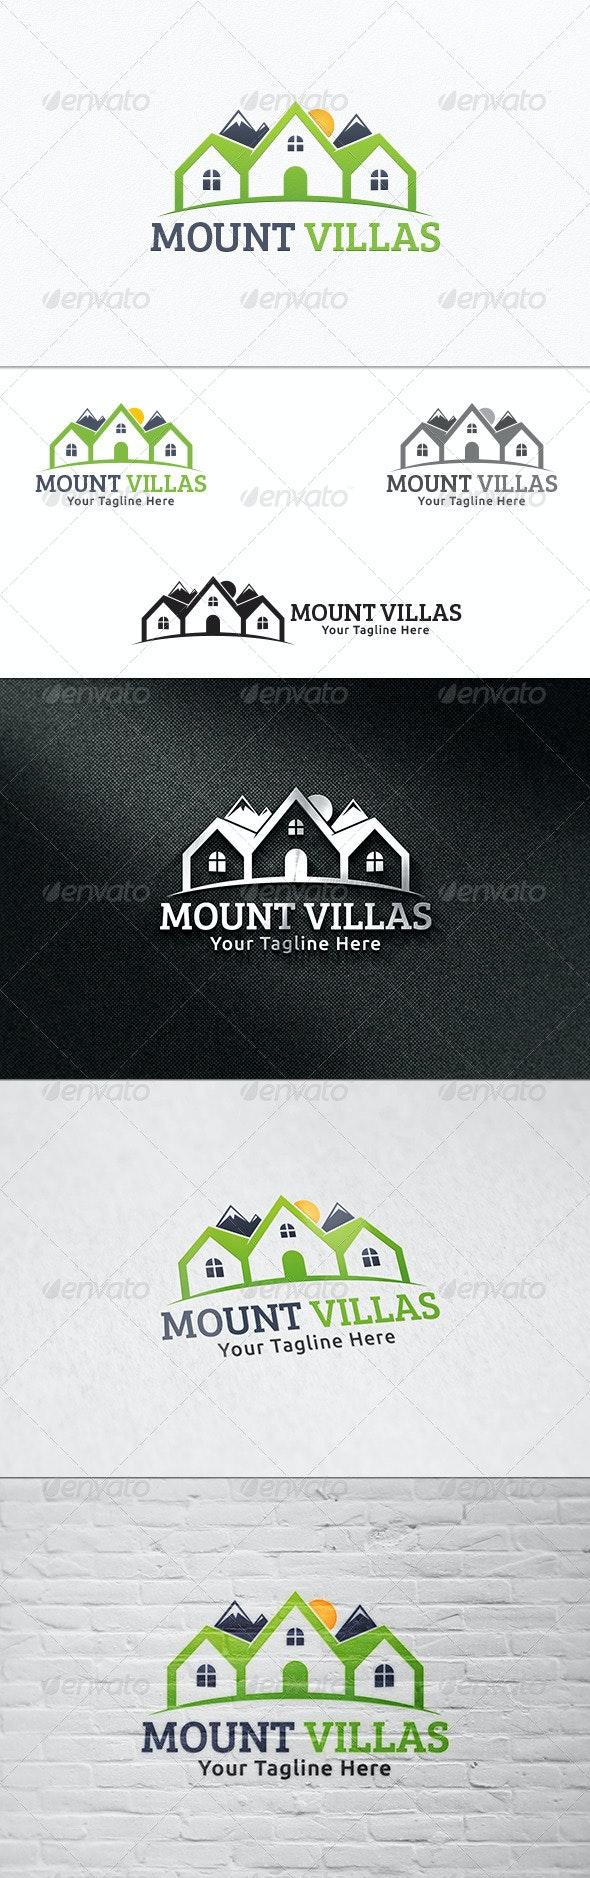 Mount Villas - Logo Template - Buildings Logo Templates